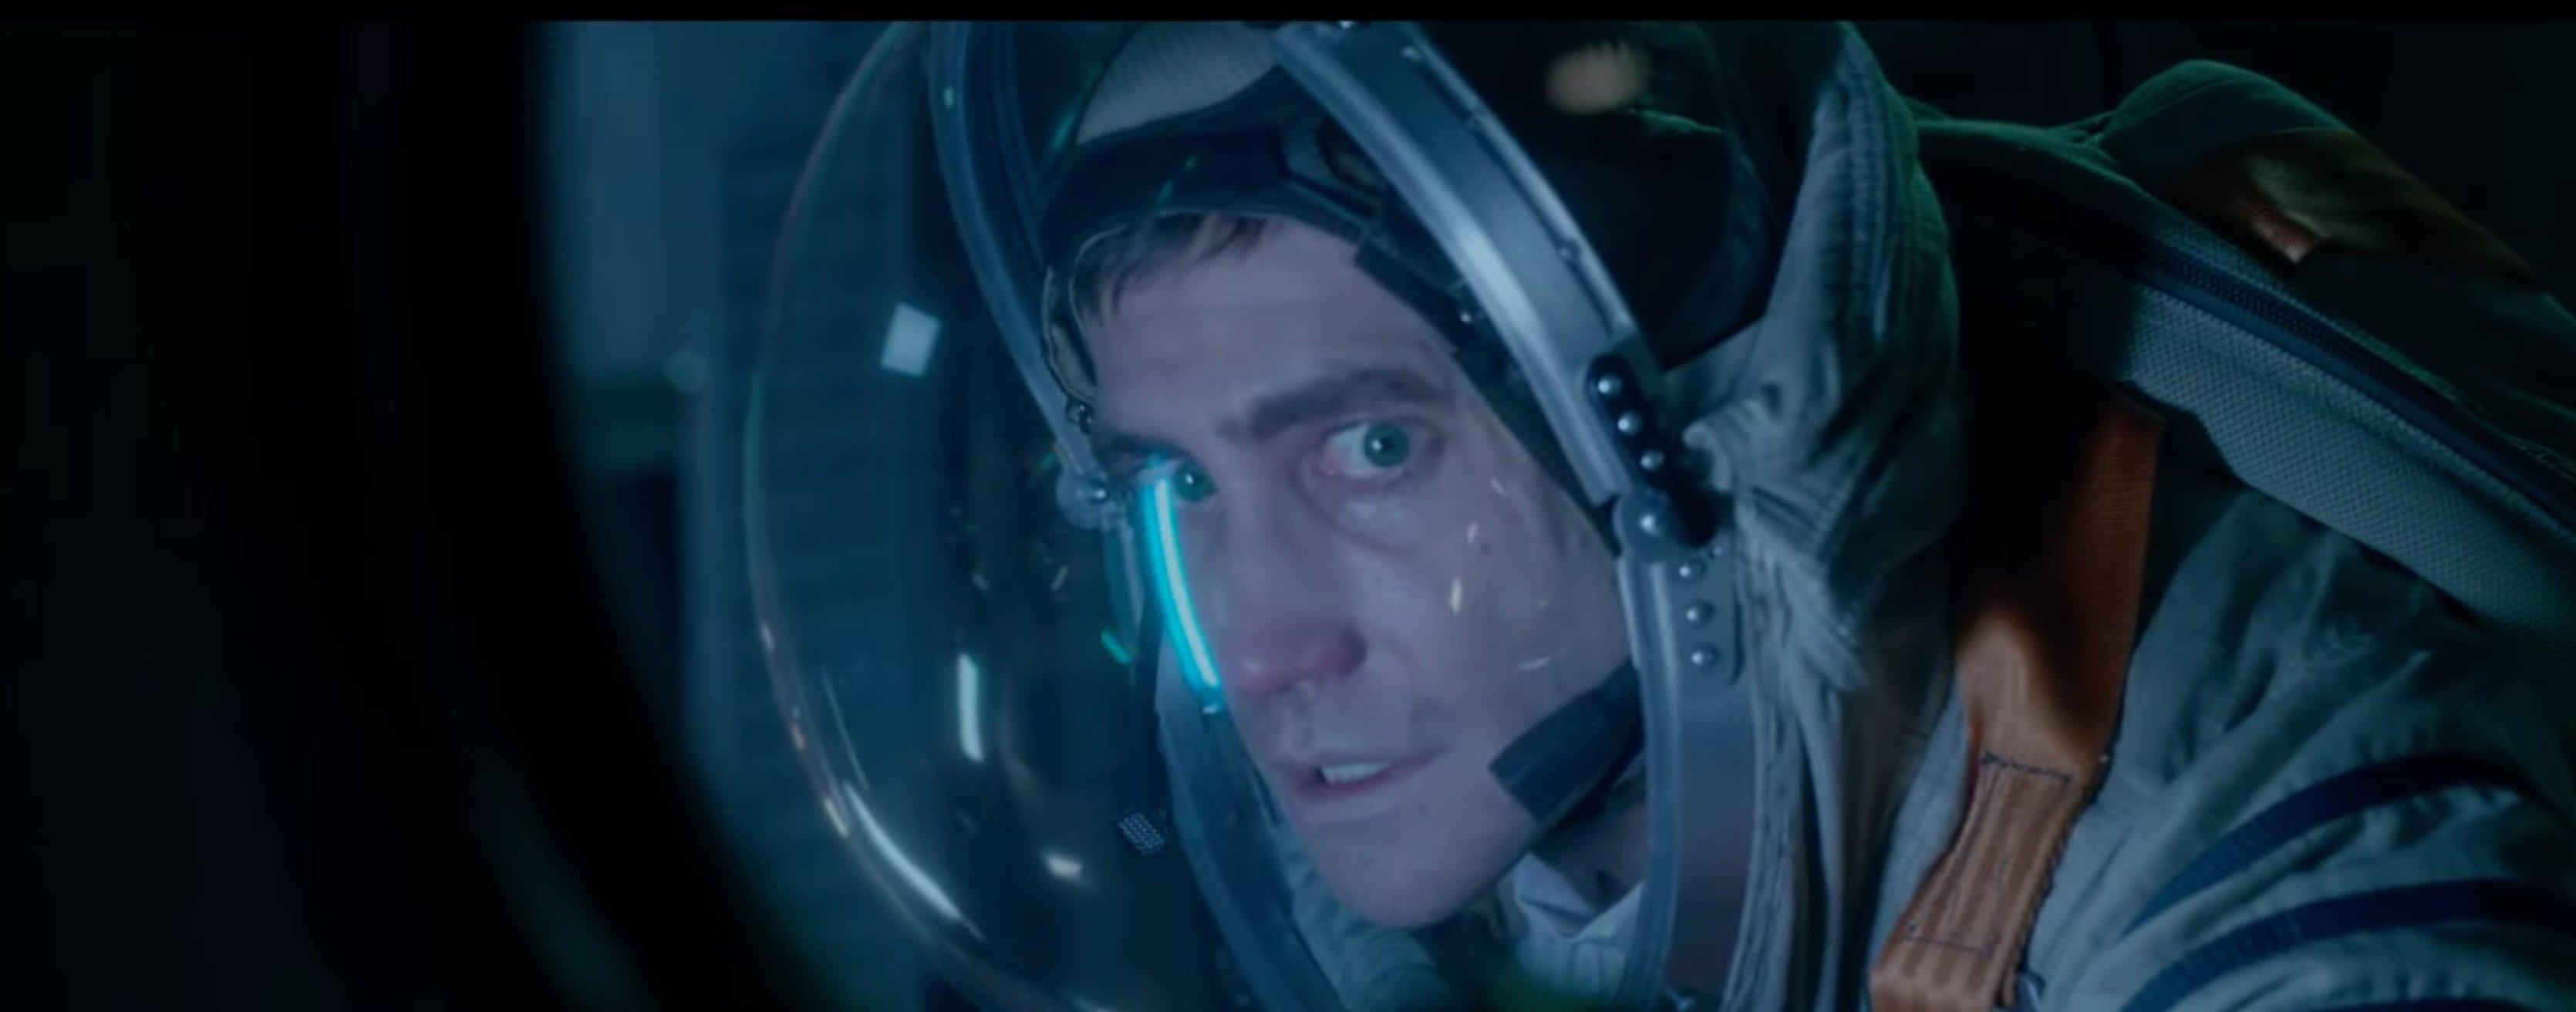 life-2017-movie-screenshot